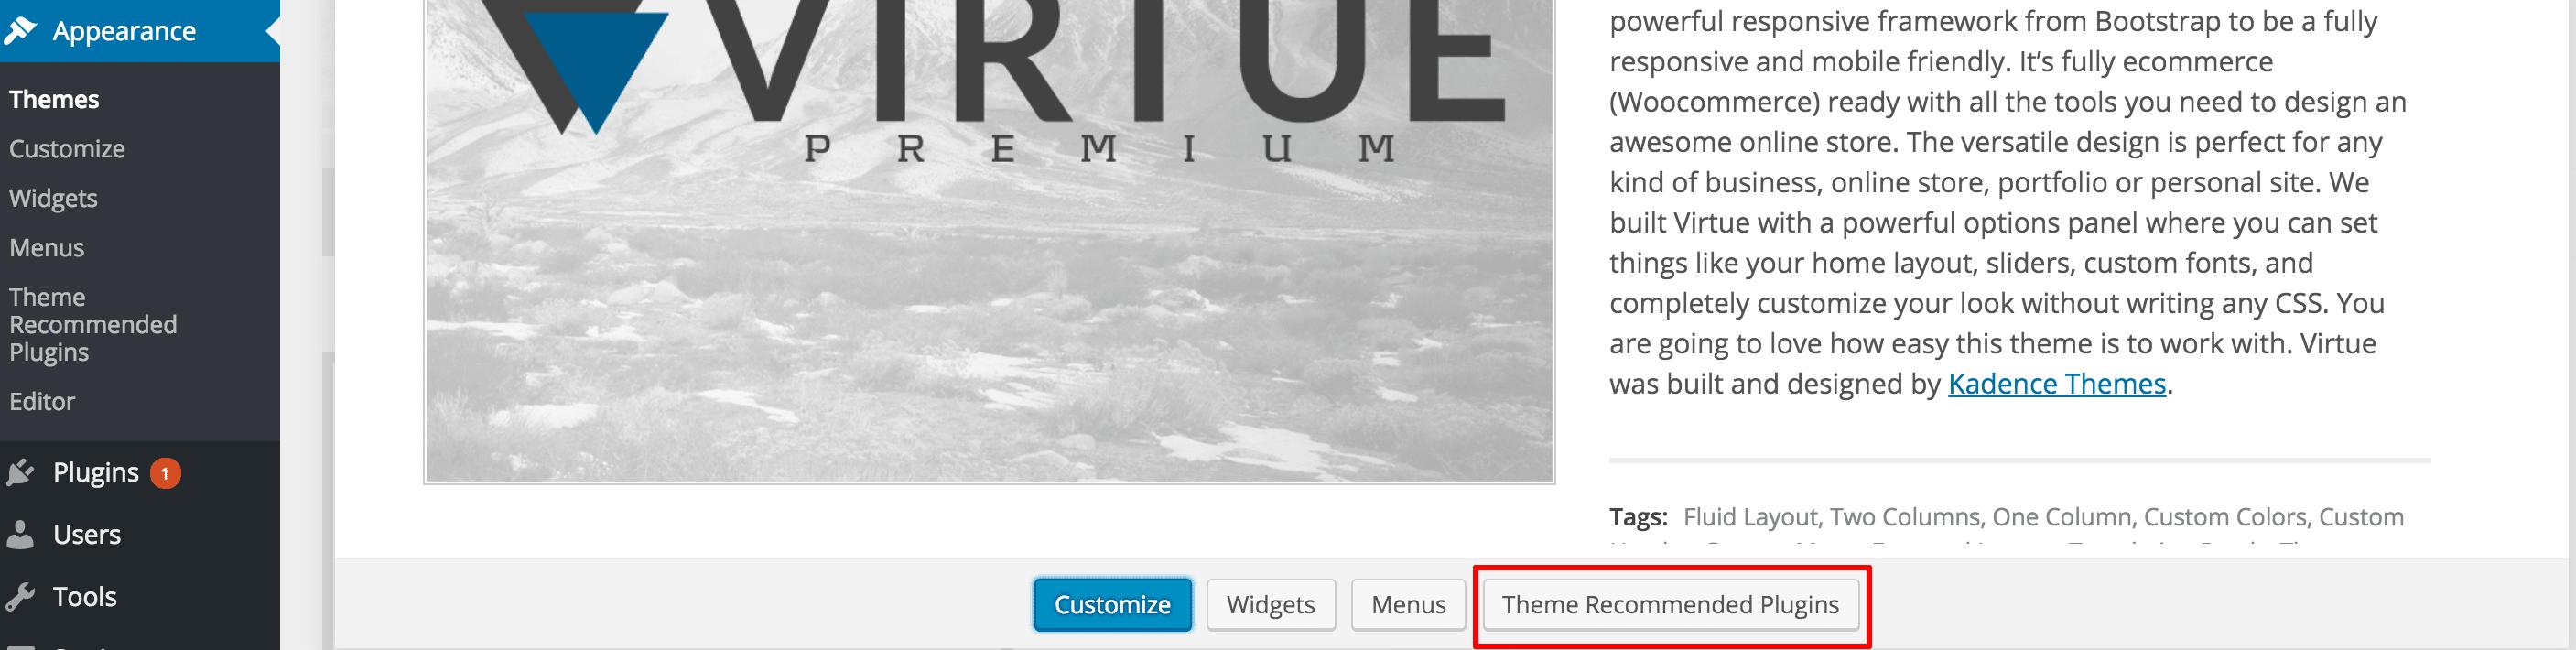 2.3 recommended plugins viatheme-min